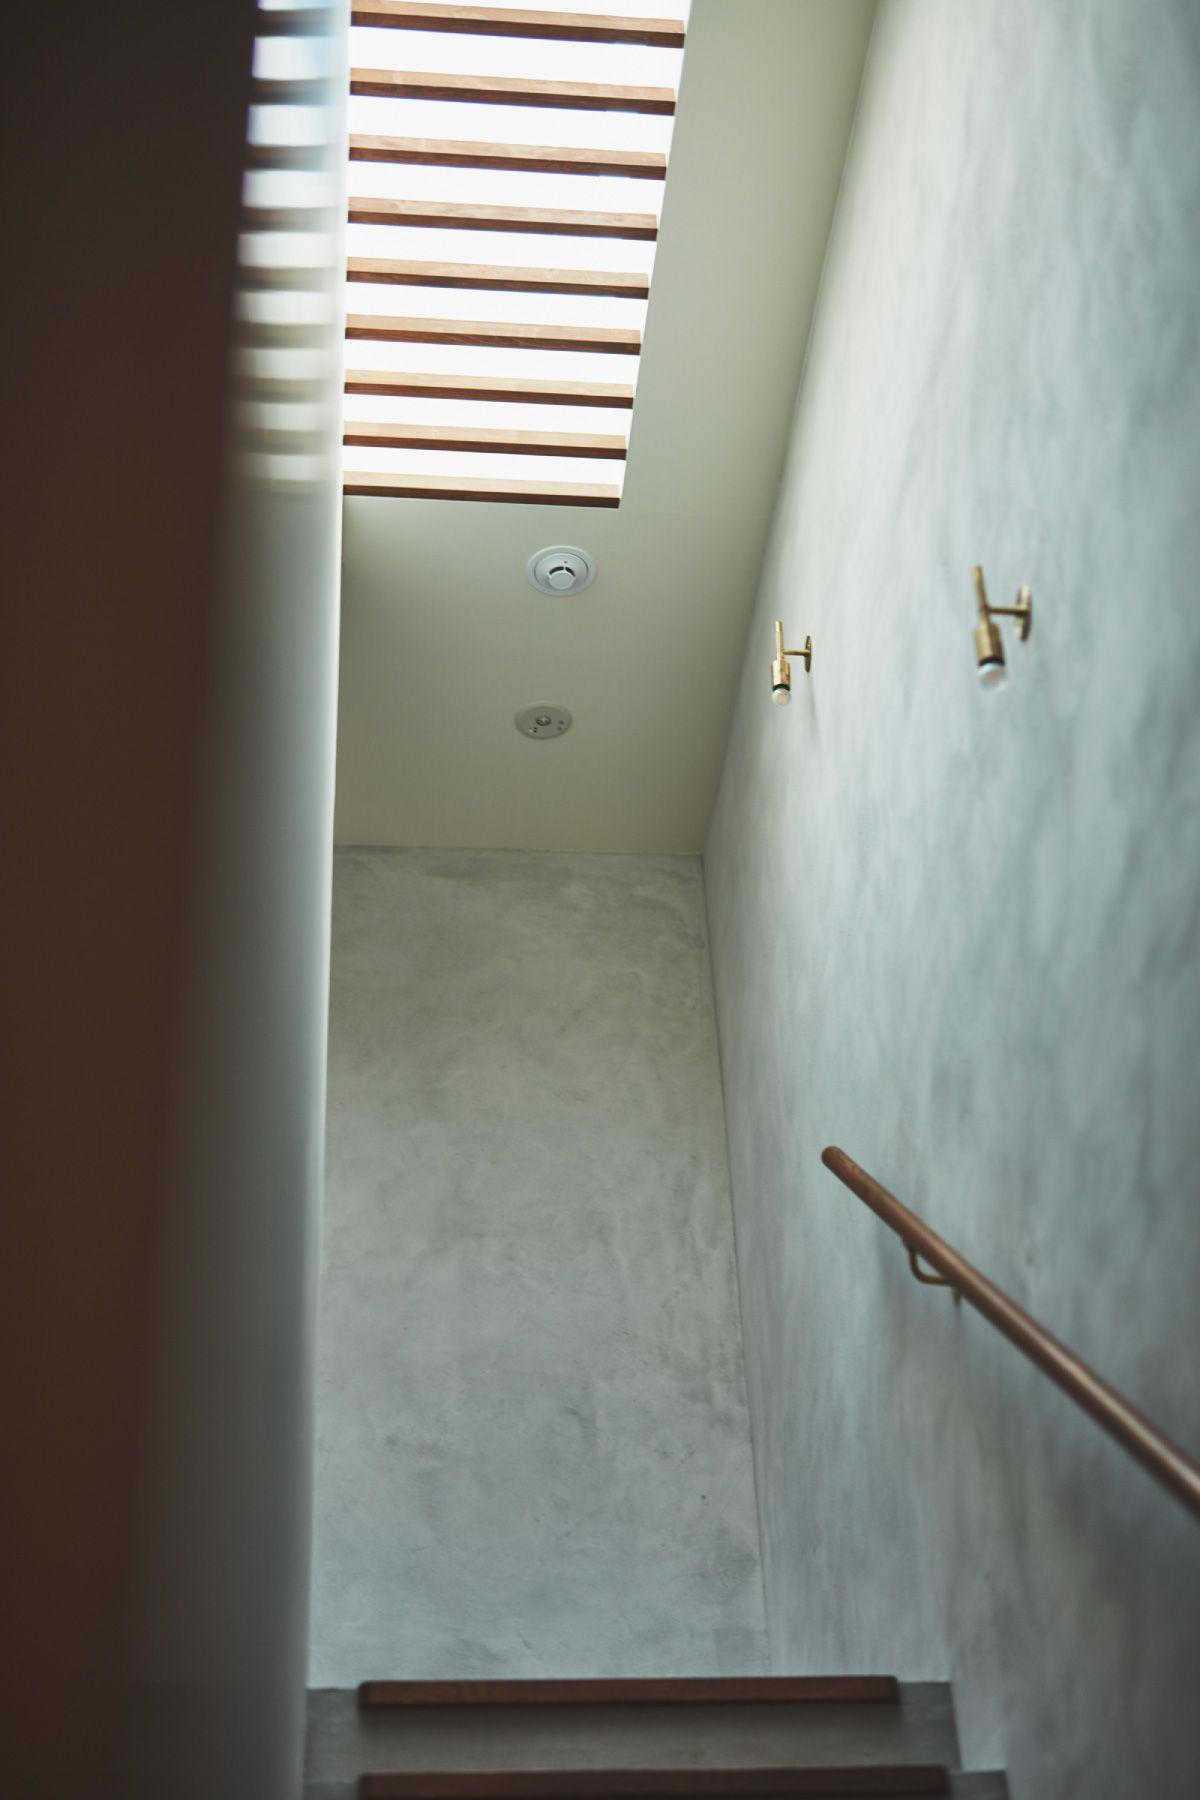 THE FLOW KAMAKURA (ザ フロウ カマクラ)SORA階段/上からの光が幻想的